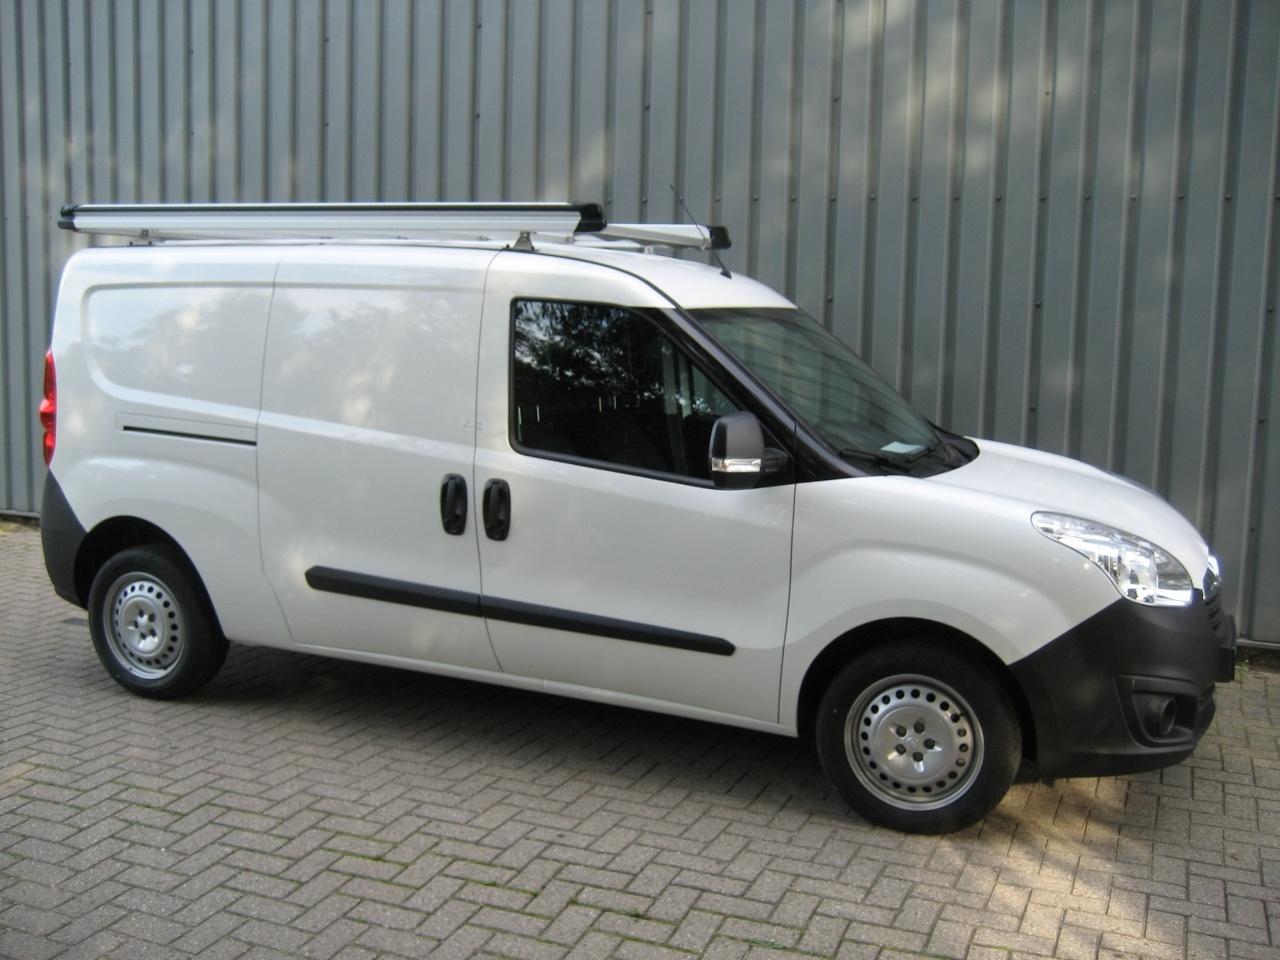 Aluminium imperiaal Opel Combo vanaf 2012 L1 H1 met achterdeuren inclusief opsteekrol